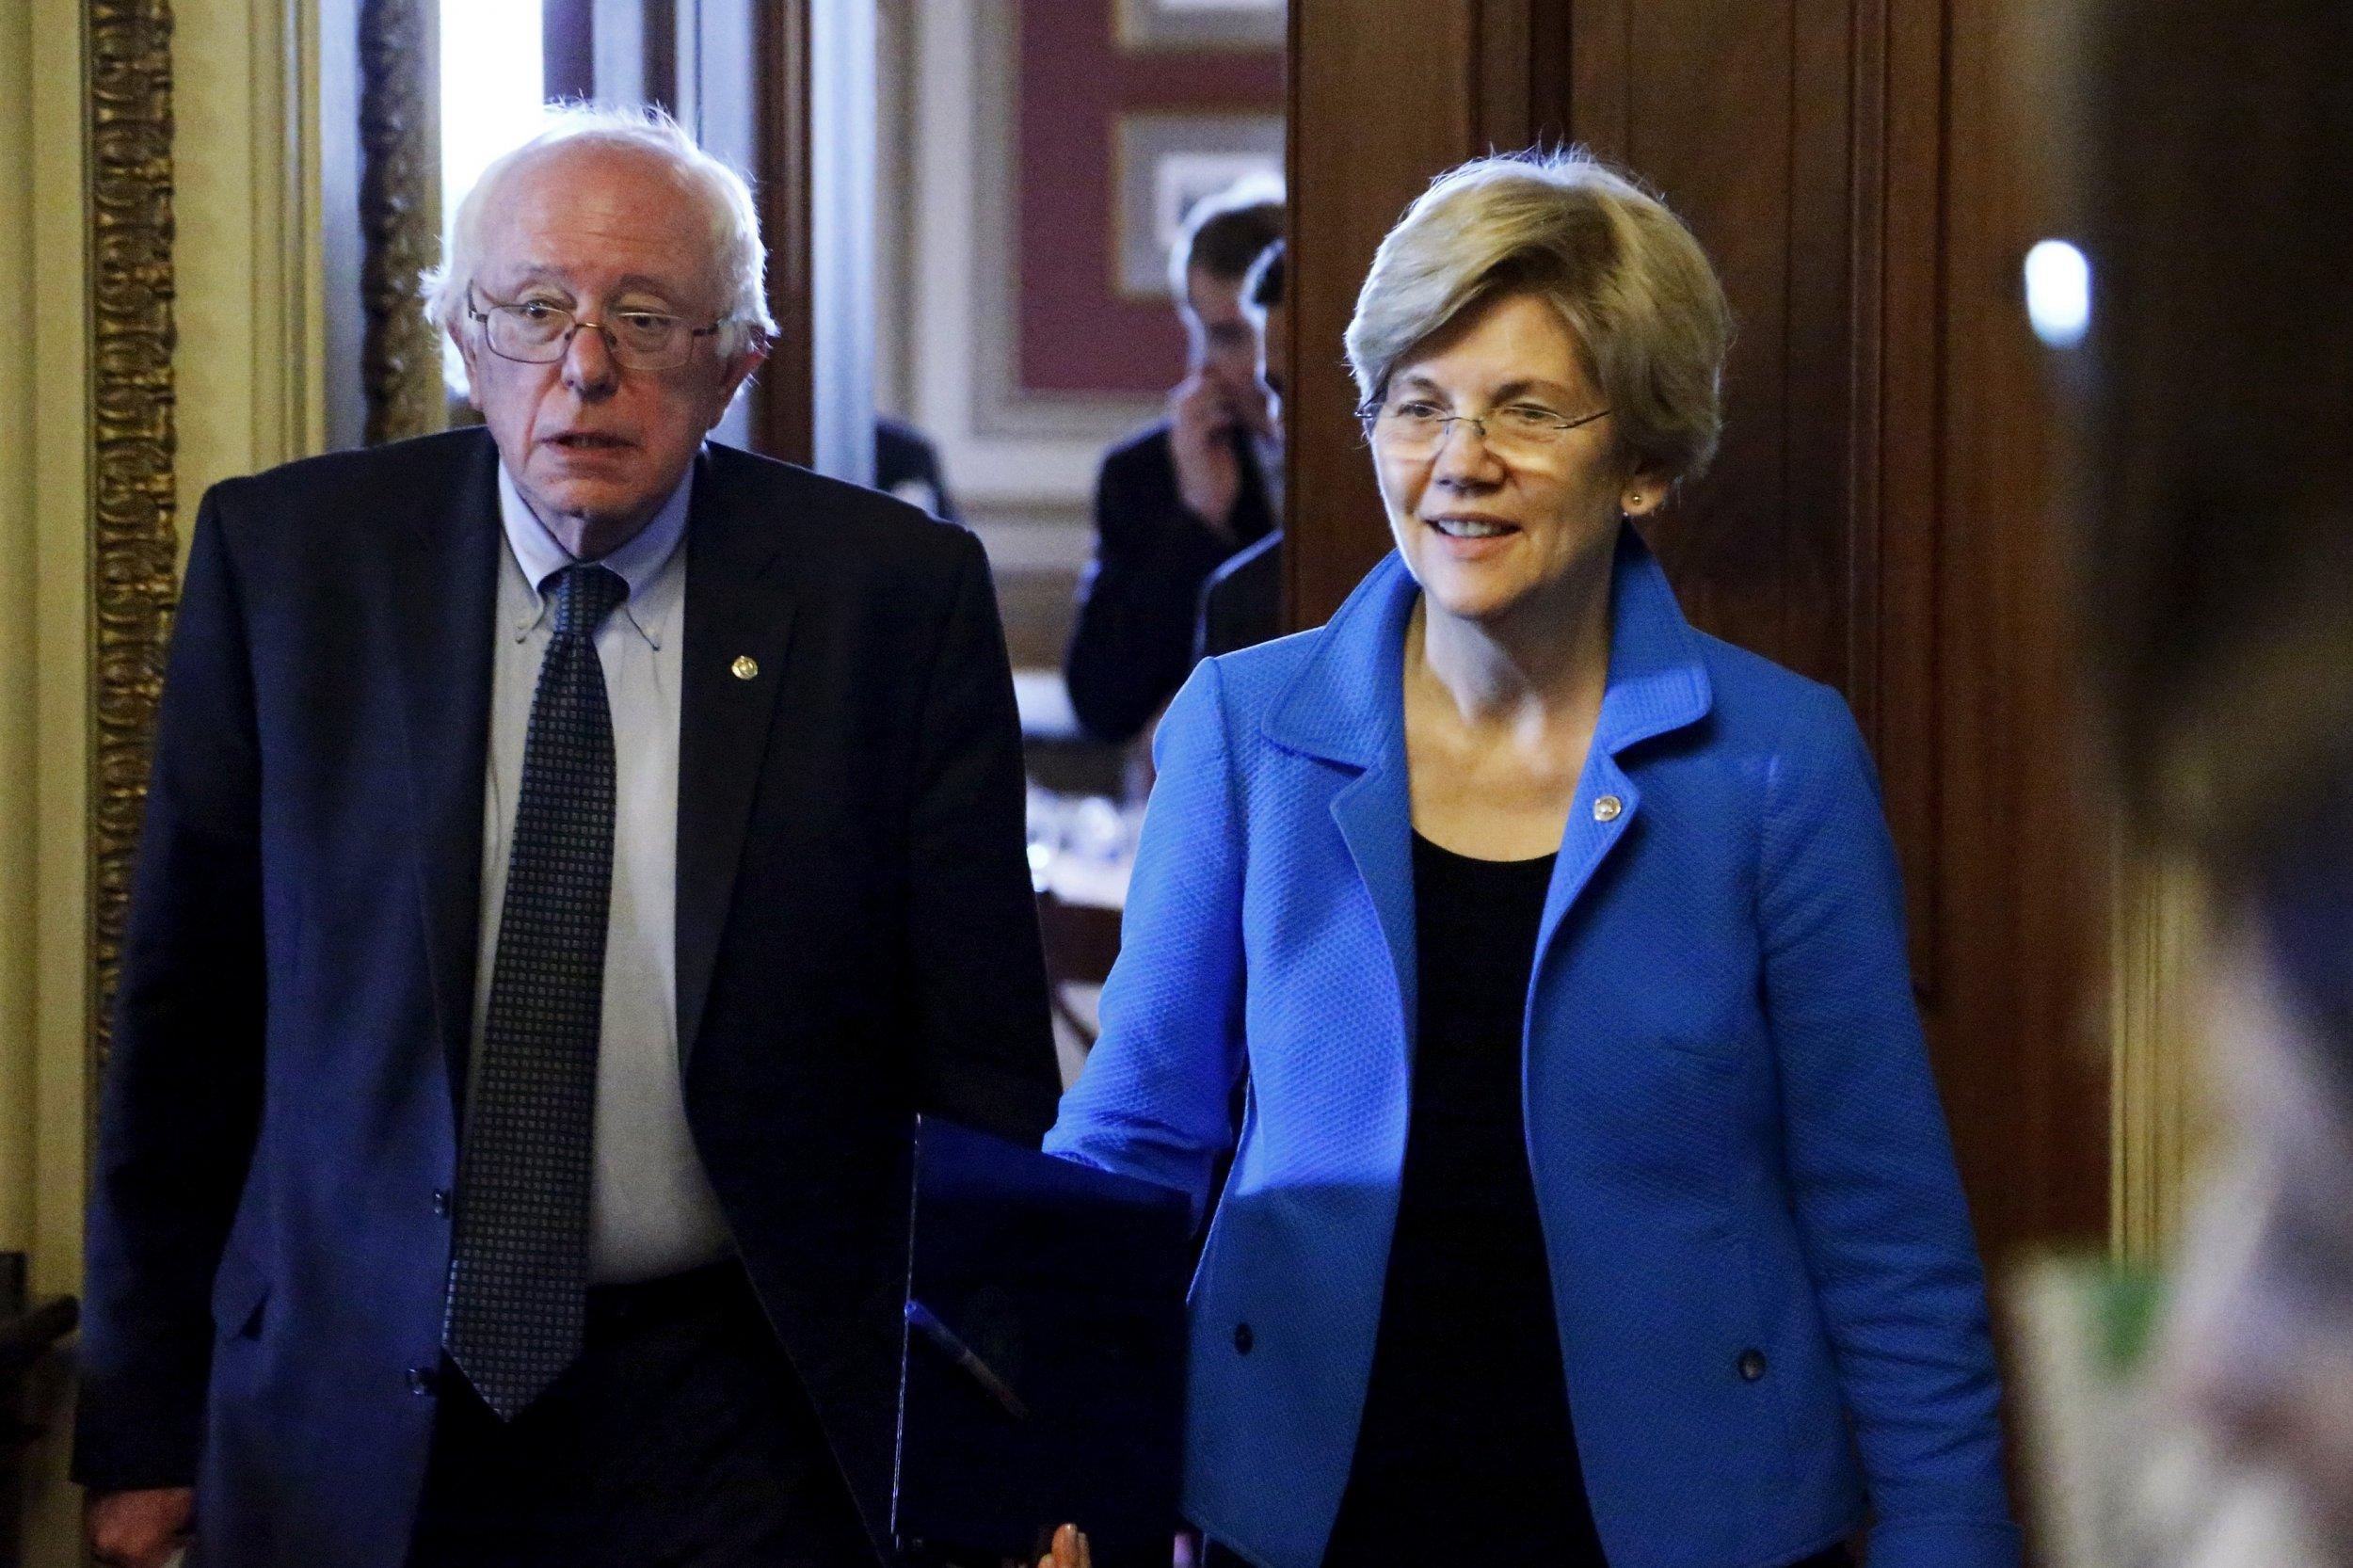 1116_Bernie_Sanders_Elizabeth_Warren_Senate_01